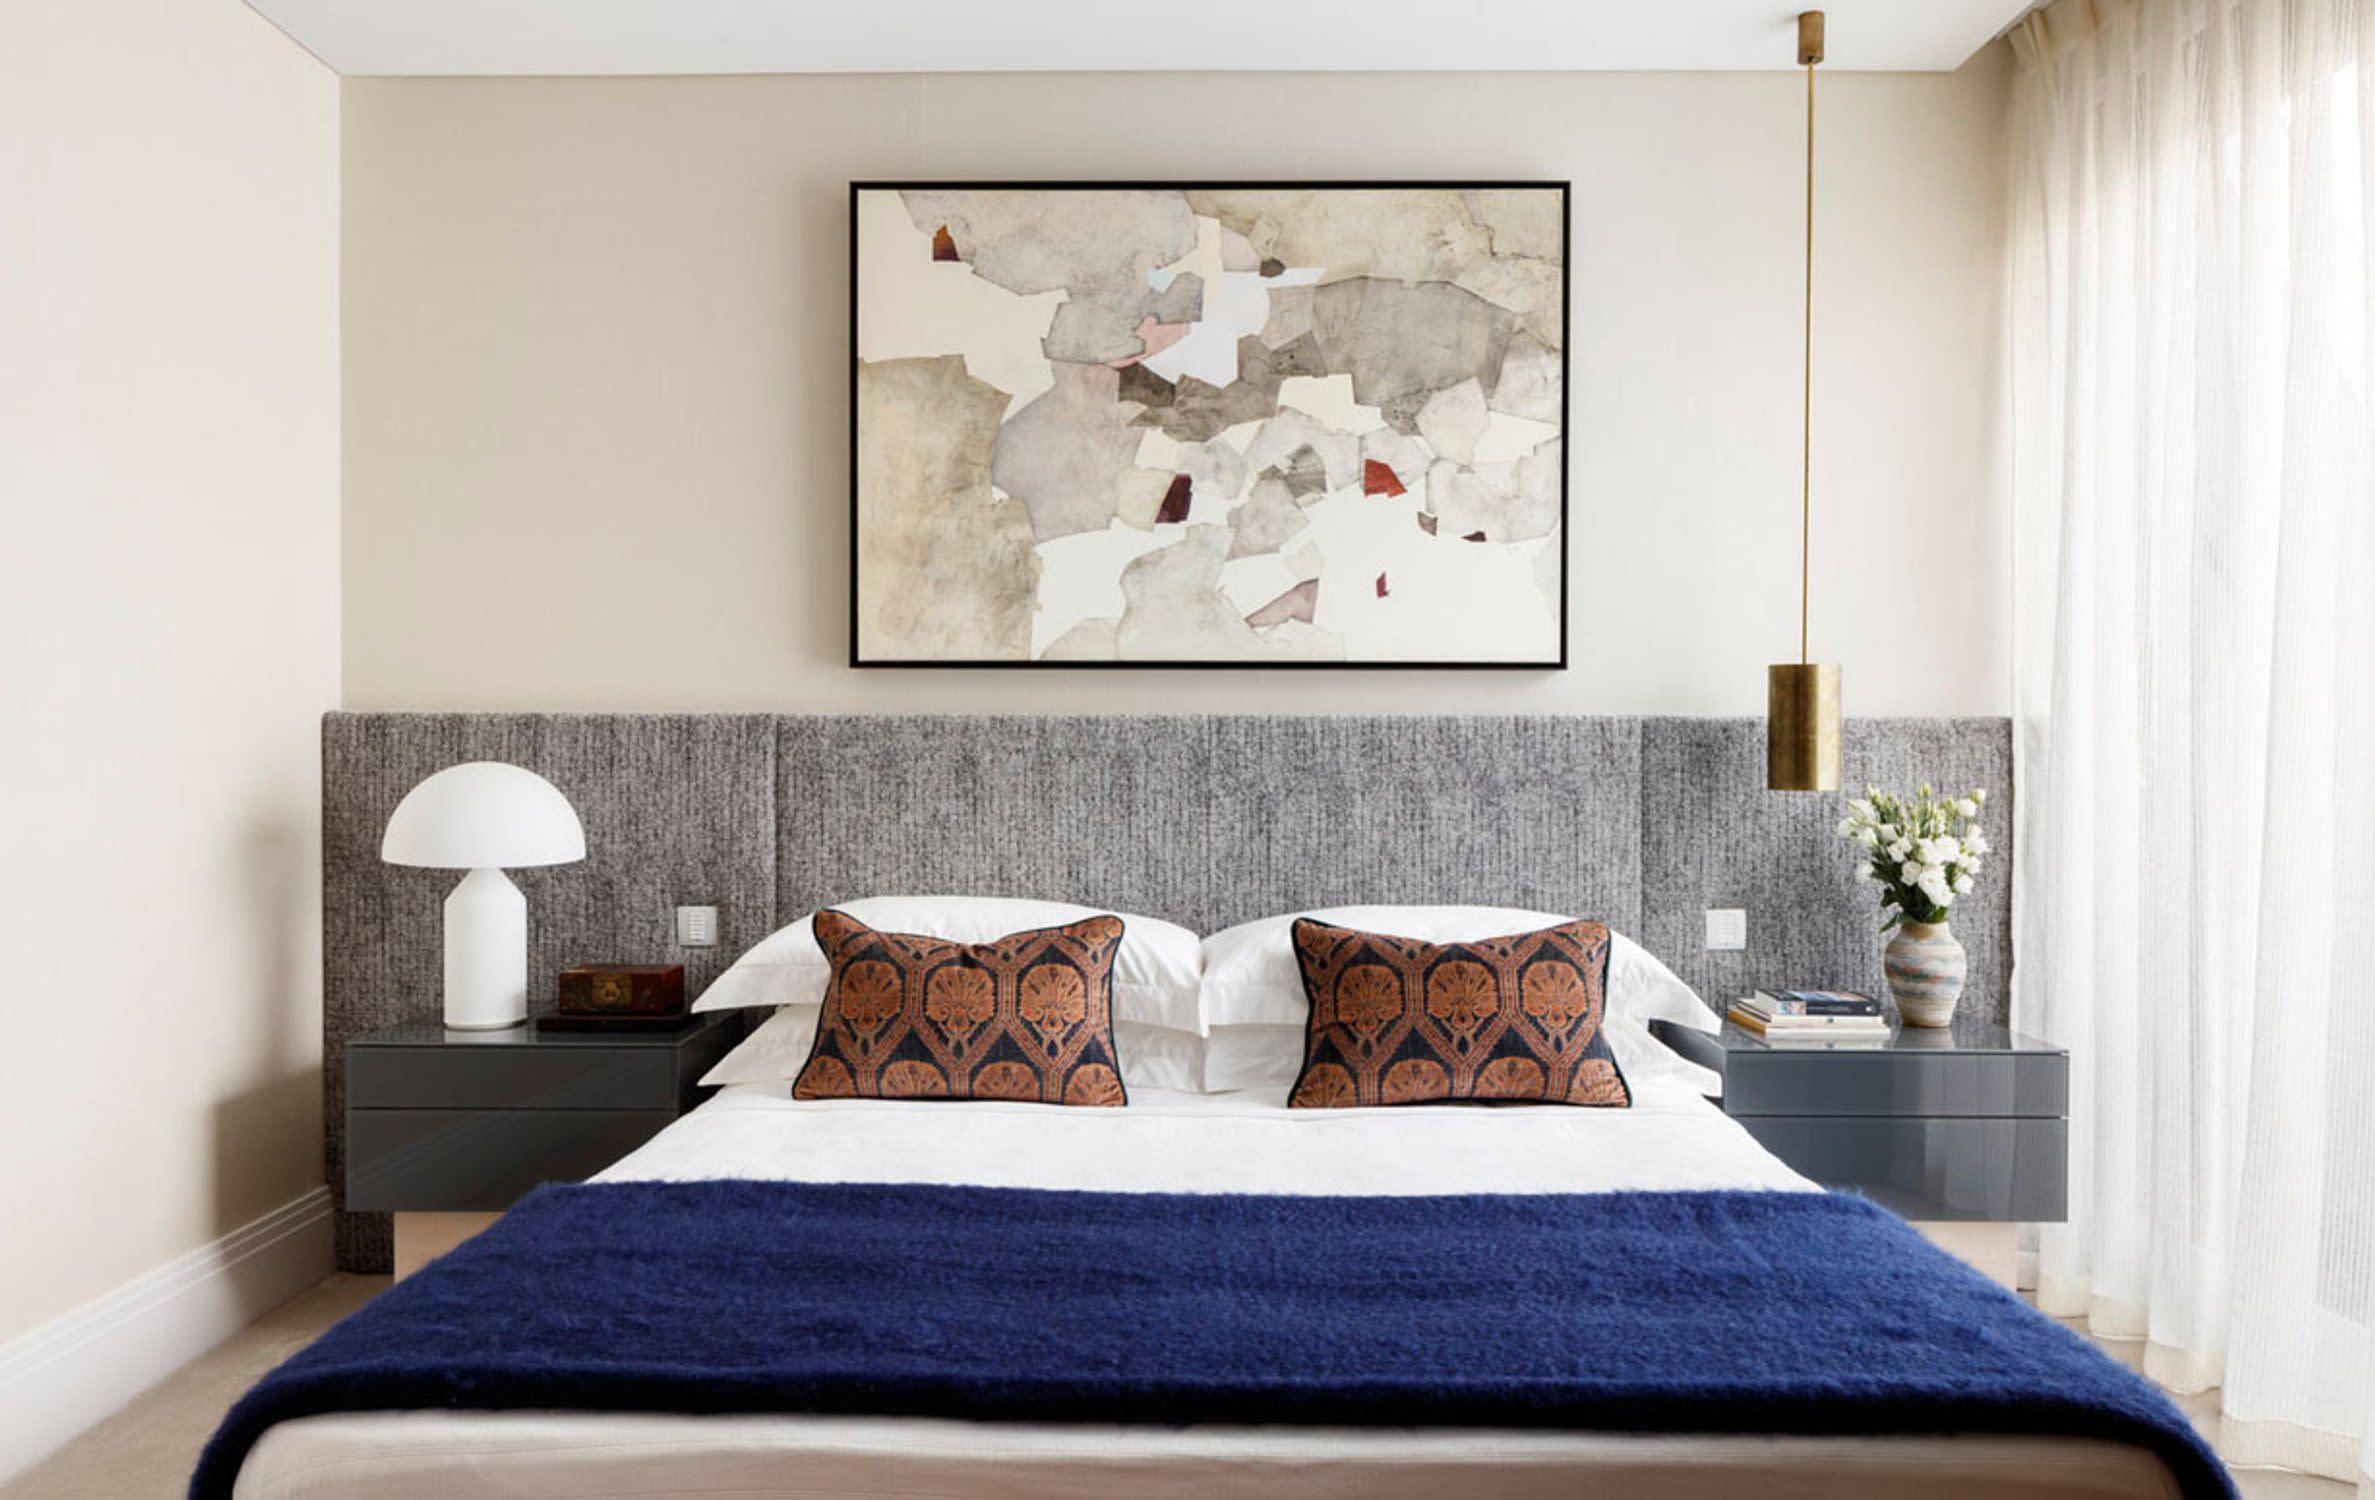 Unique Bedroom Decorating Ideas: Unique Bedroom Décor Ideas You Haven't Seen Before